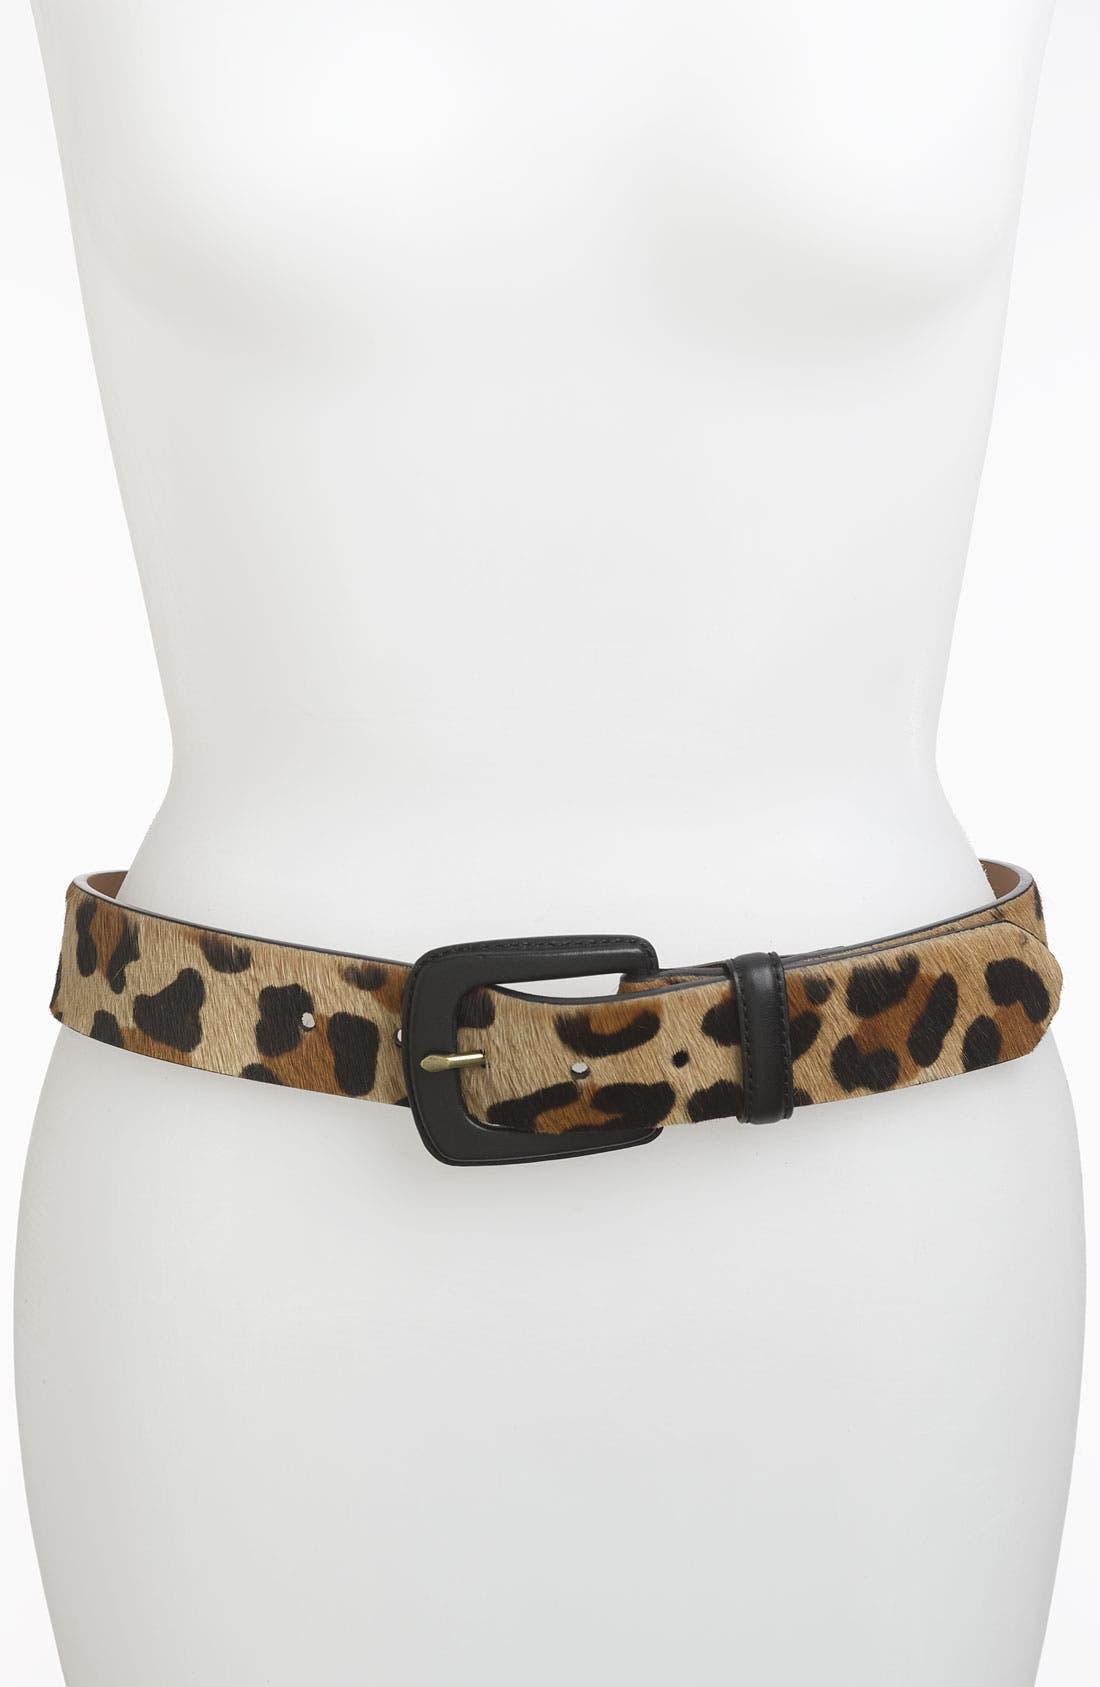 Main Image - Lauren Ralph Lauren Leopard Print Calf Hair Belt